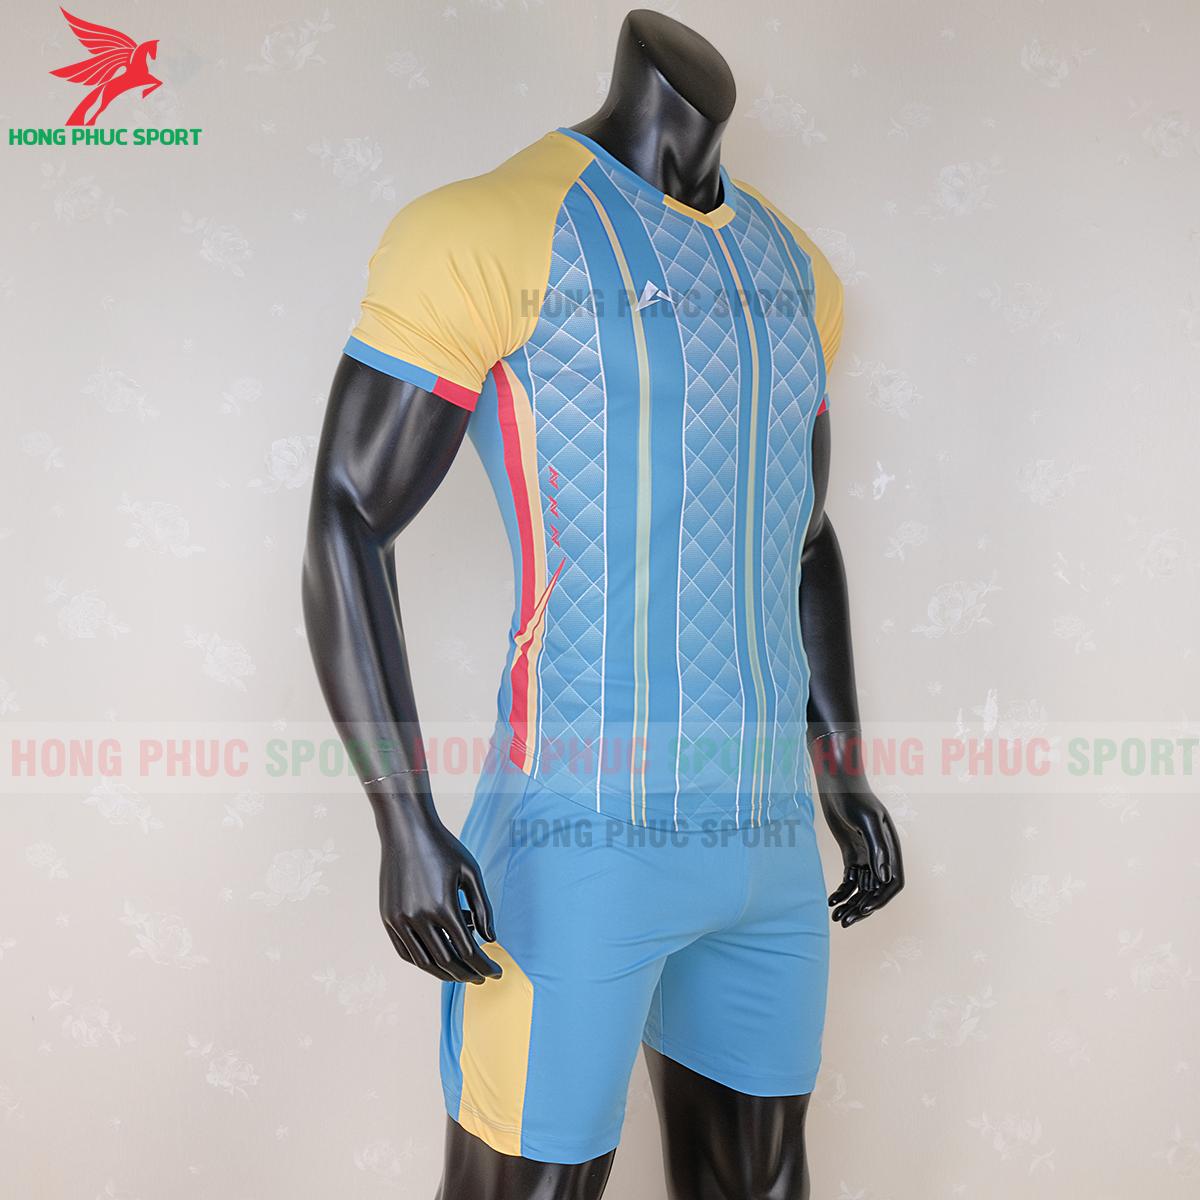 https://cdn.hongphucsport.com/unsafe/s4.shopbay.vn/files/285/ao-bong-da-khon-logo-kaiwin-zeus-mau-2-3-5f729a2a7dad8.png